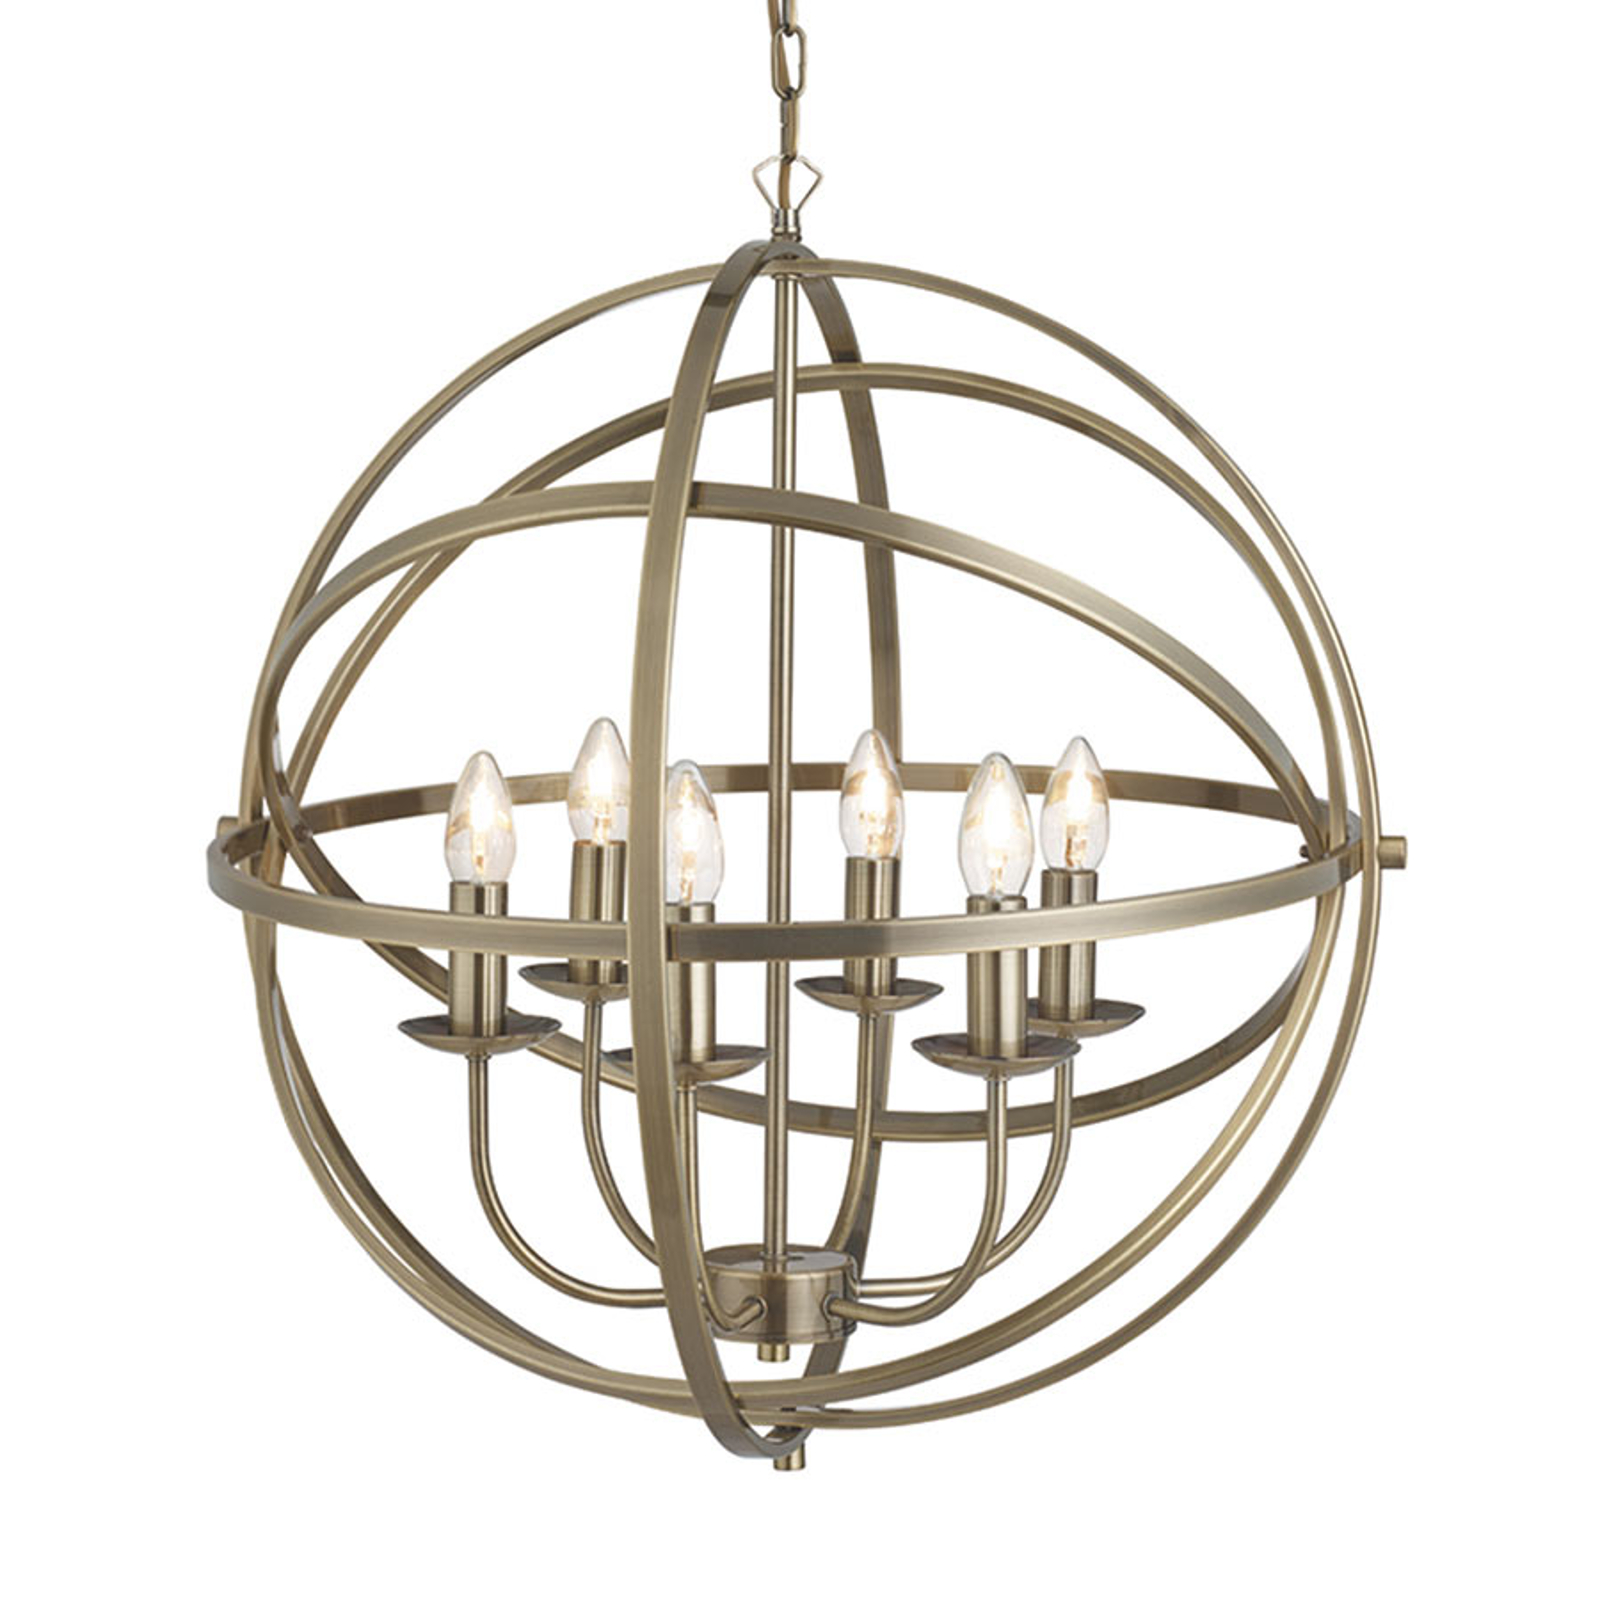 Acquista Aggraziata lampada a sosp Orbit design a gabbia